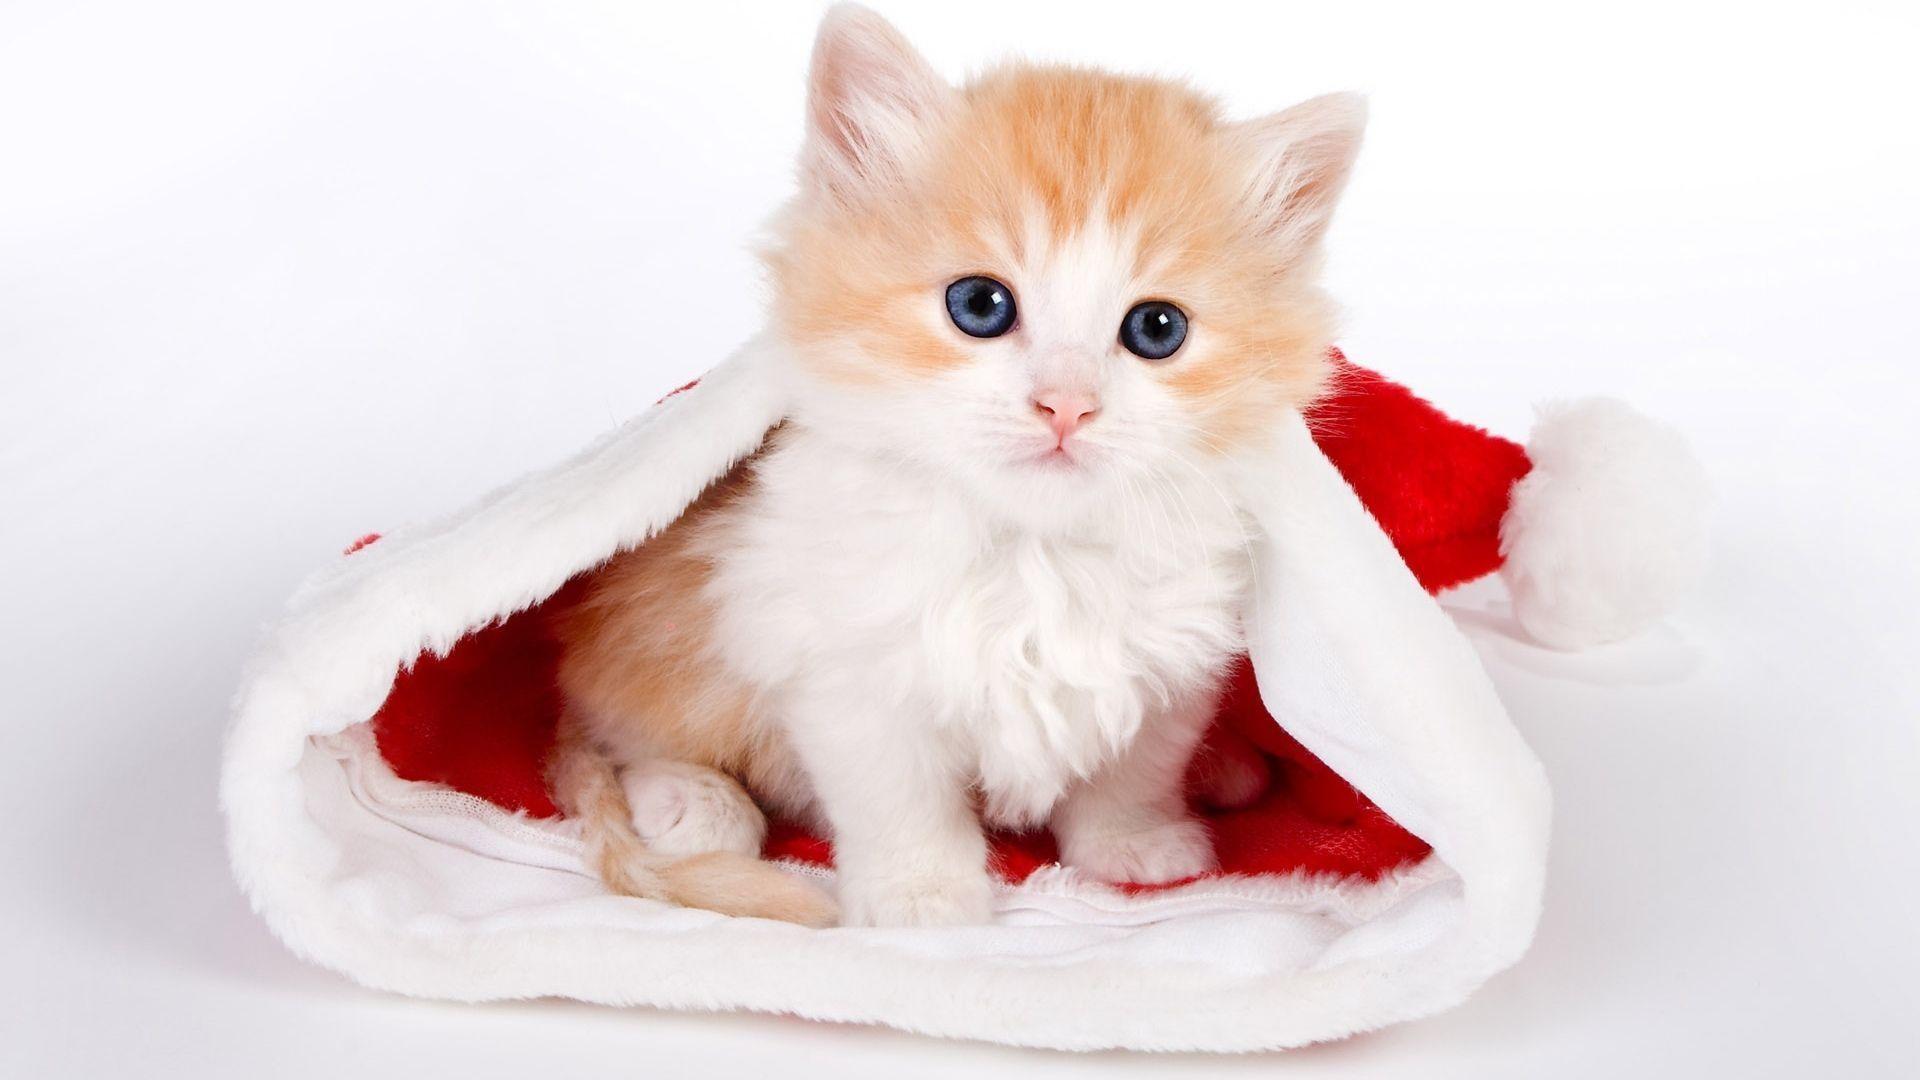 1920x1080 wallpapers for cute kitten wallpaper desktop